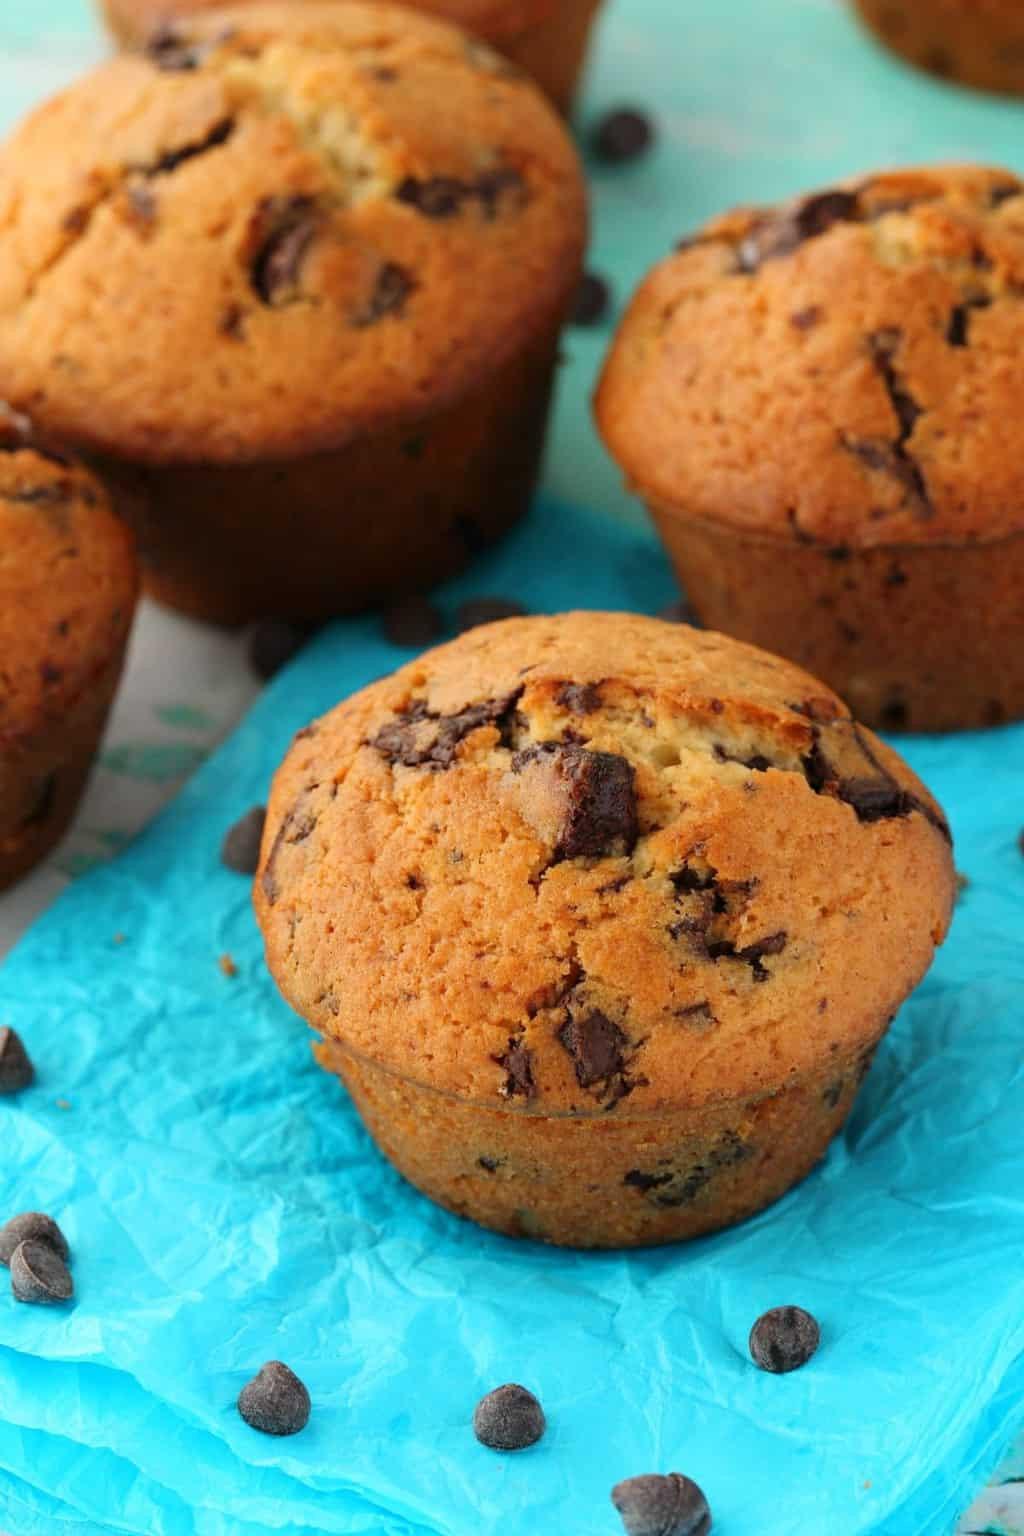 Vegan Chocolate Chip Muffins  Vegan Chocolate Chip Muffins Moist and Rich Loving It